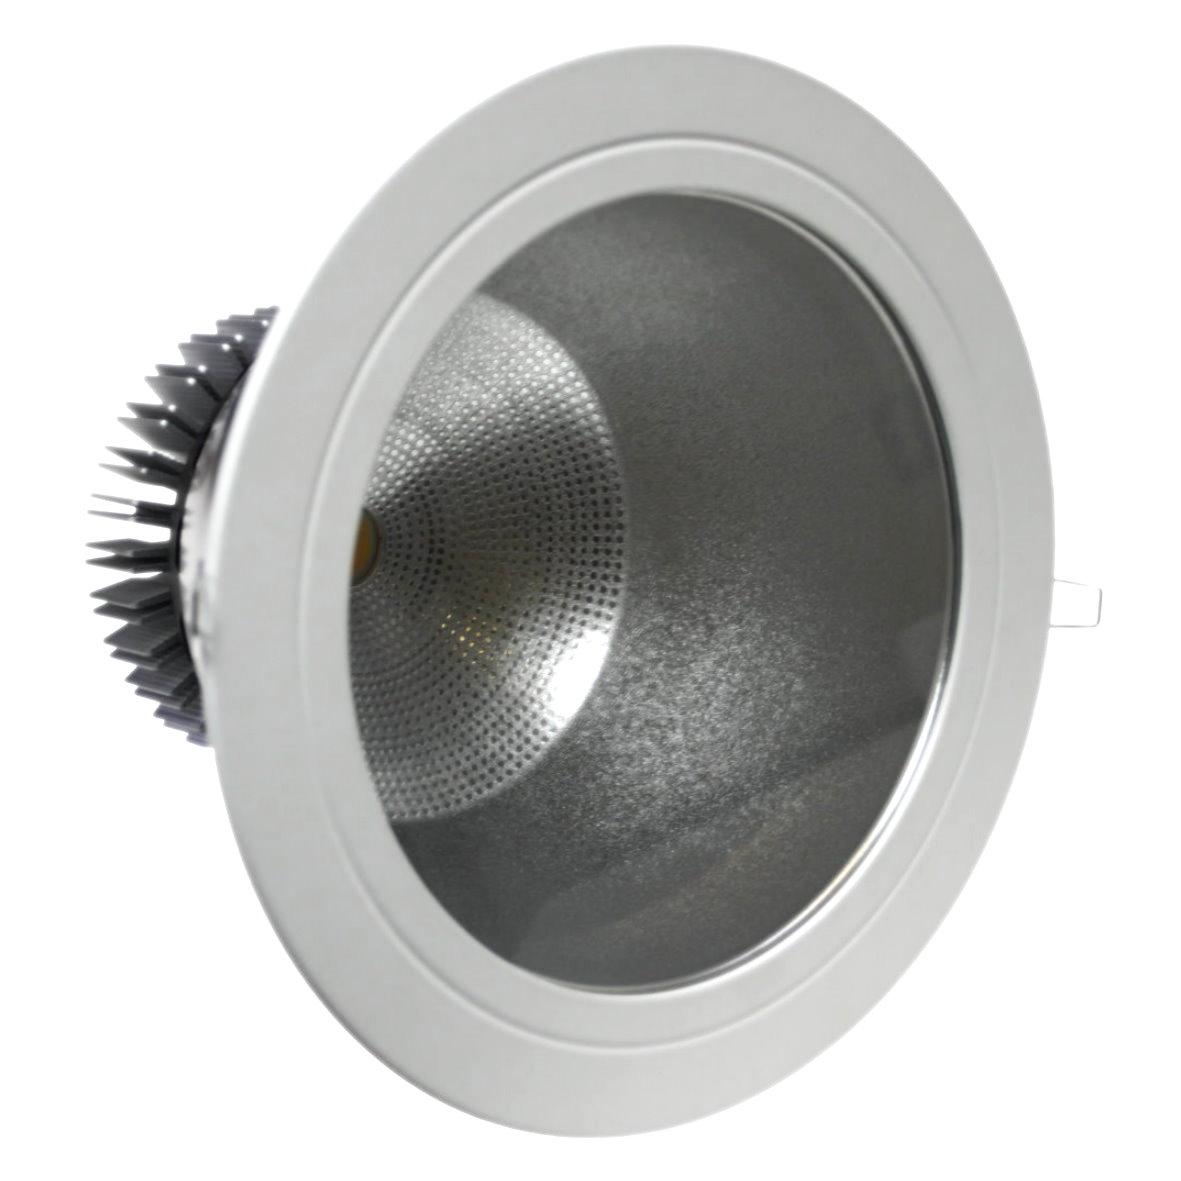 cob led highbay gewerbe industrie einbauleuchte leuchte spot strahler decke lamp ebay. Black Bedroom Furniture Sets. Home Design Ideas